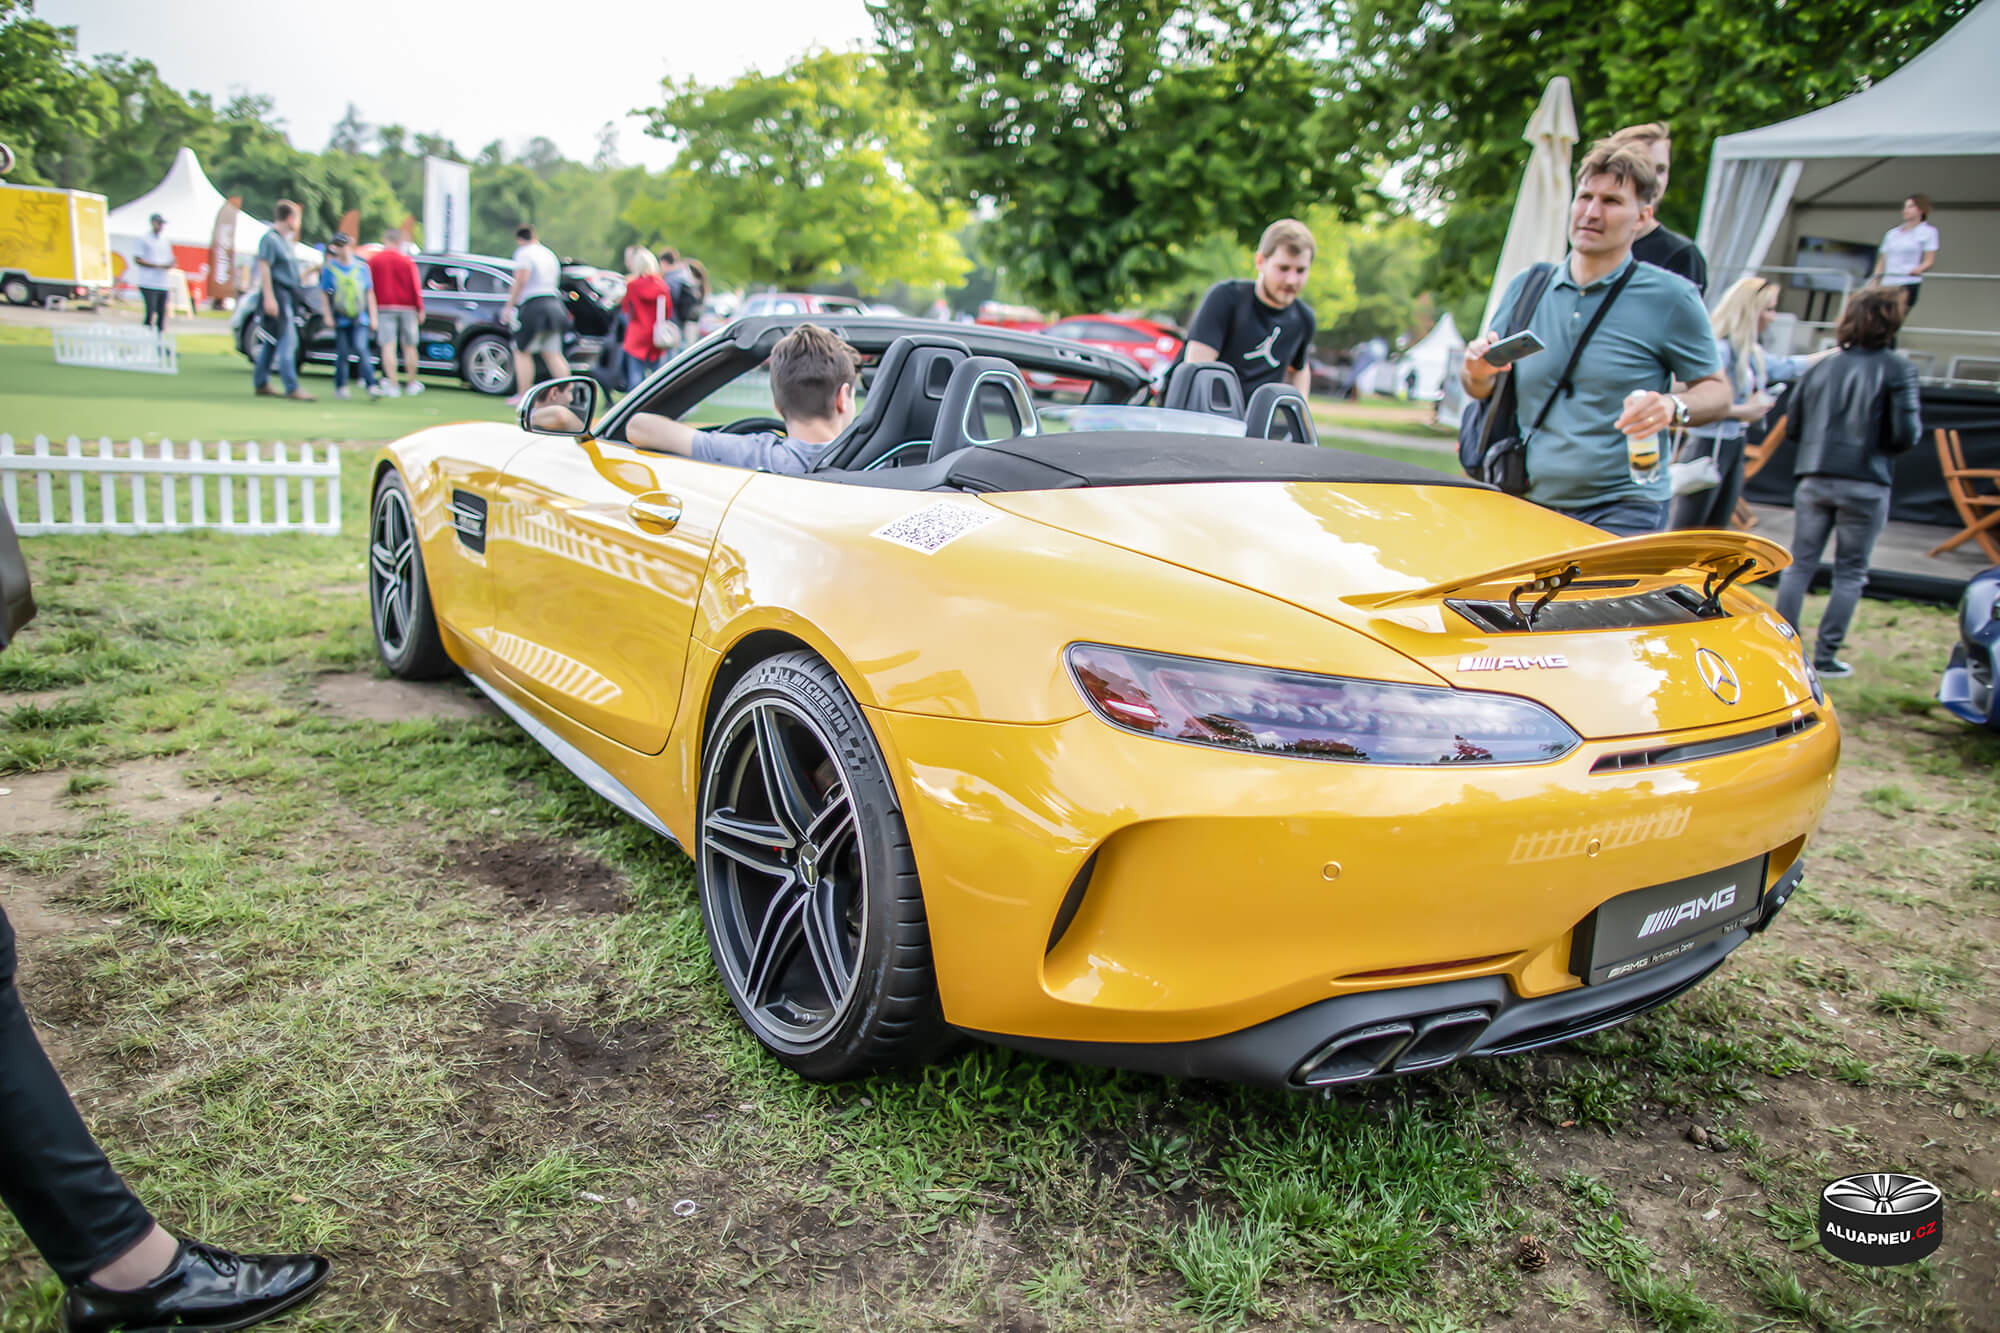 Litá kola original Mercedes Amg Gt Roadster - Automobilové Legendy 2019 - www.aluapneu.cz